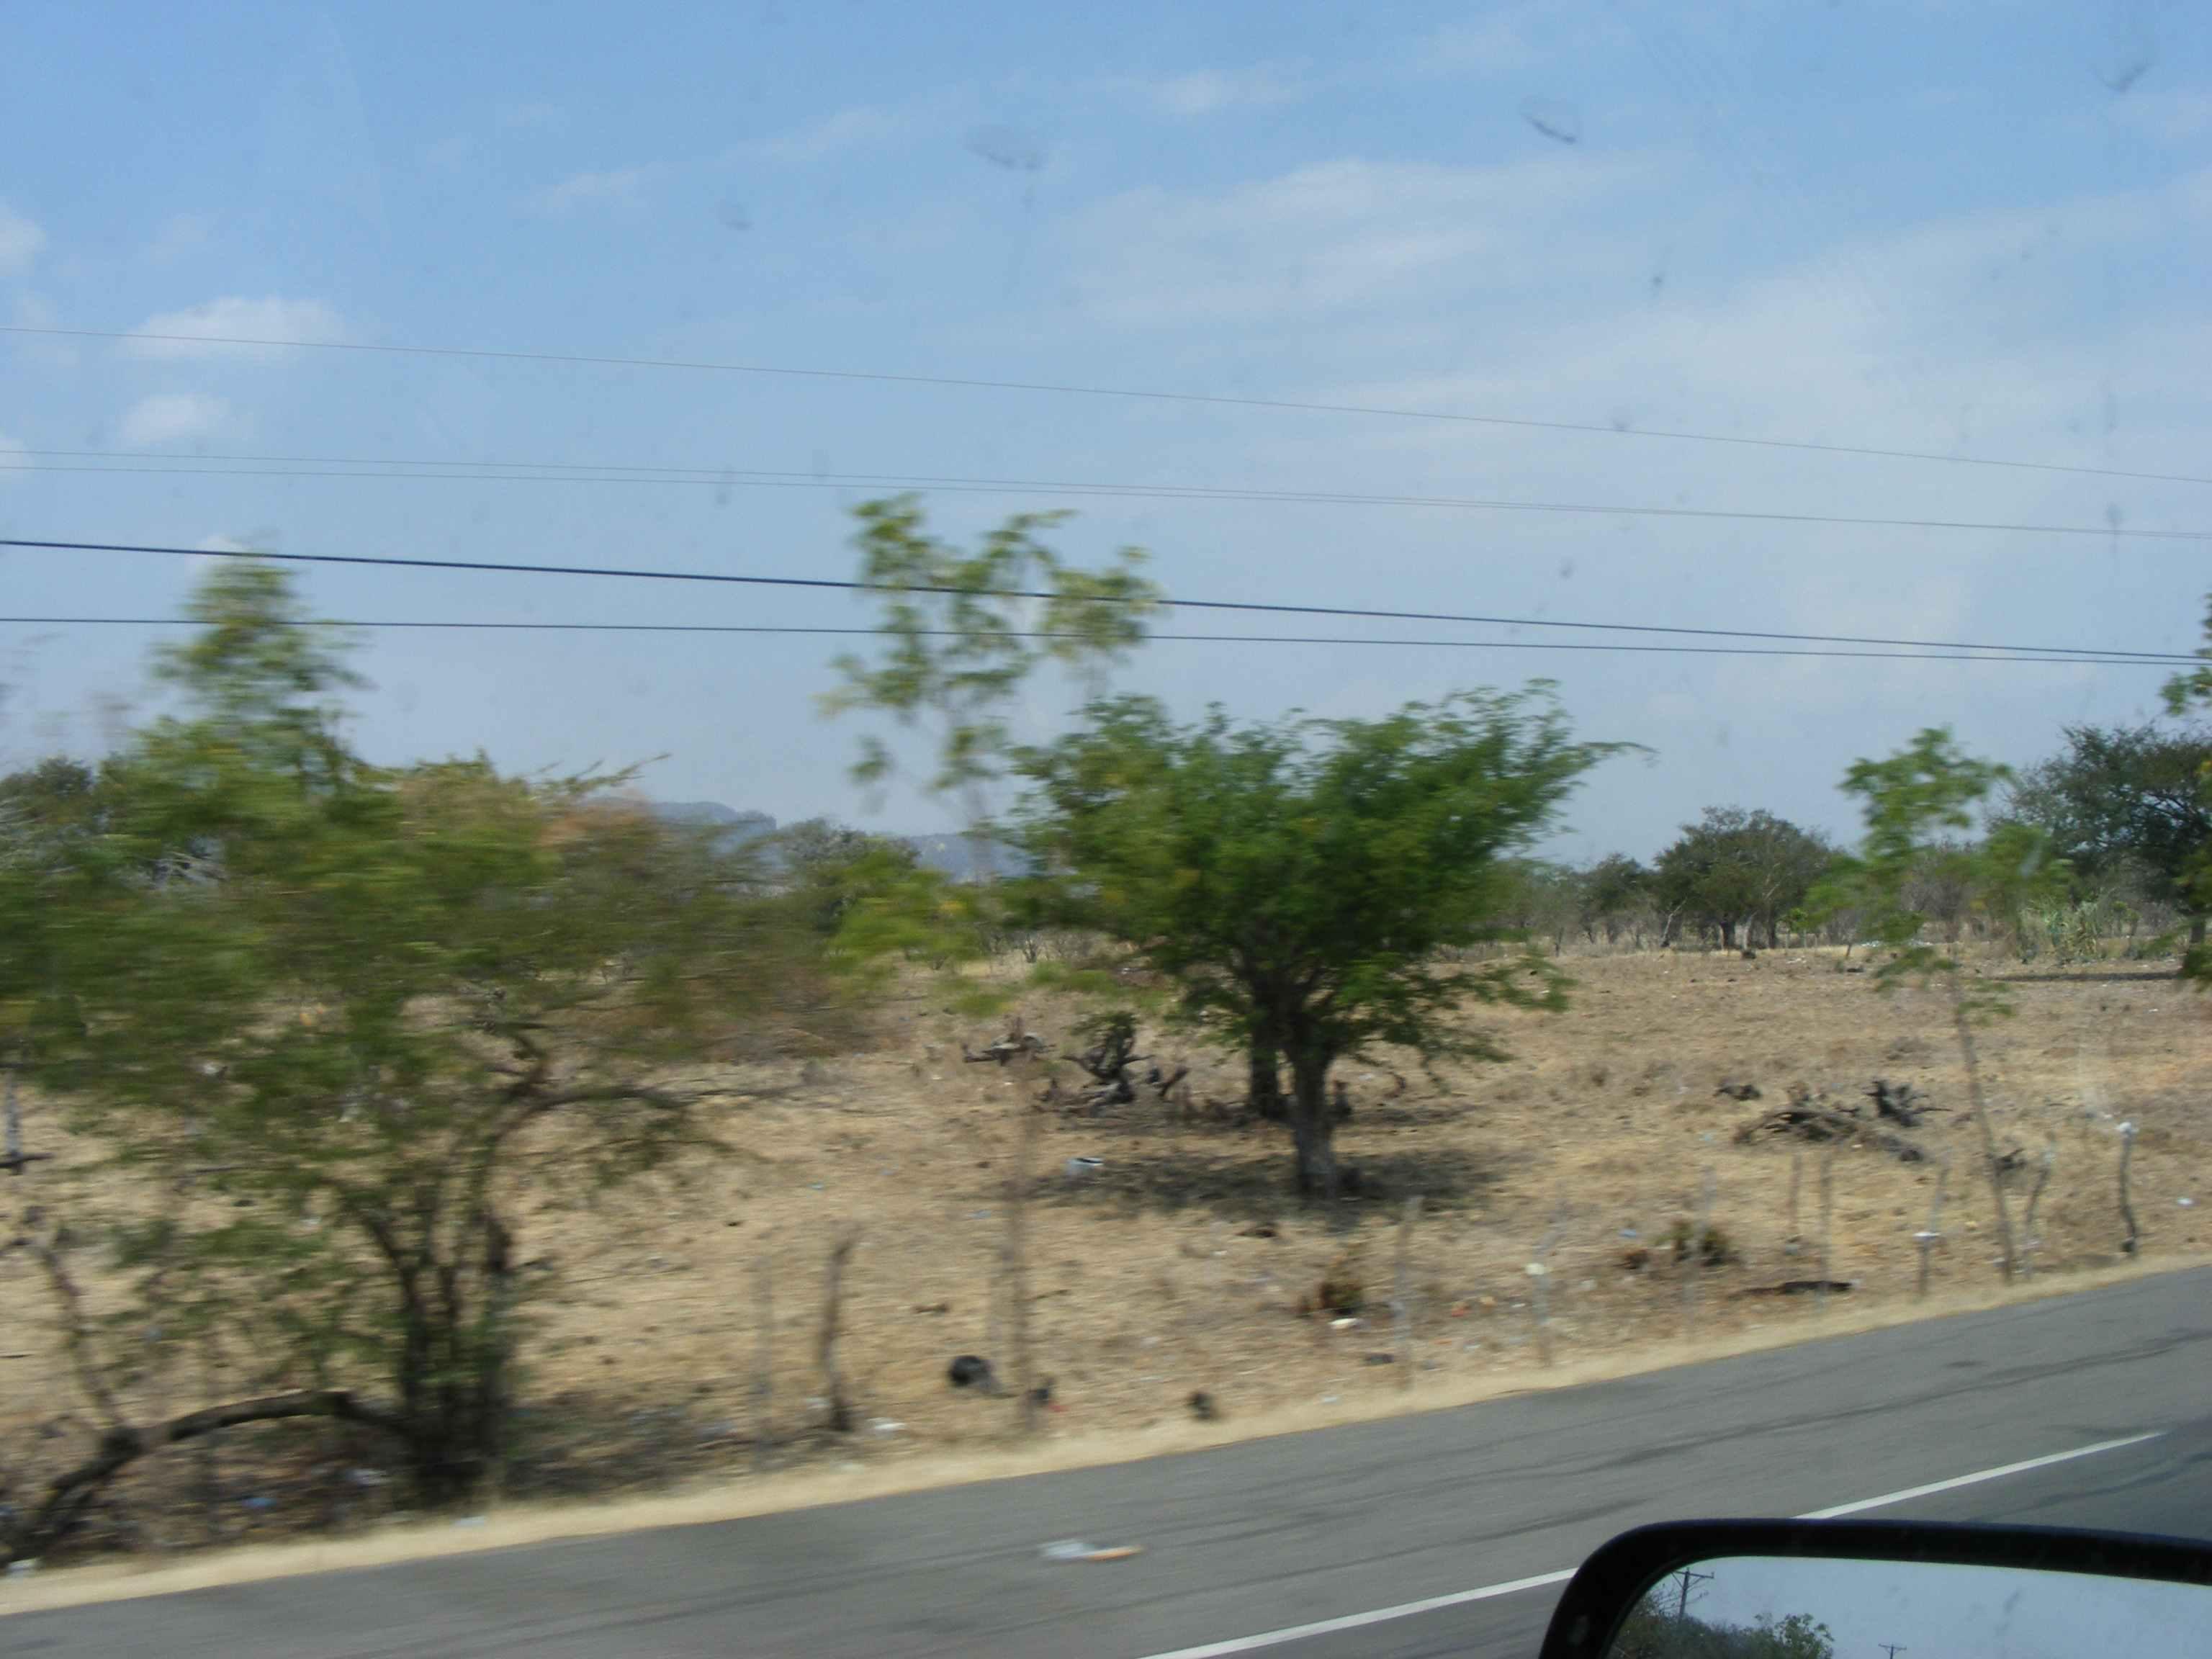 Desert Like Landscape Approaching Honduras